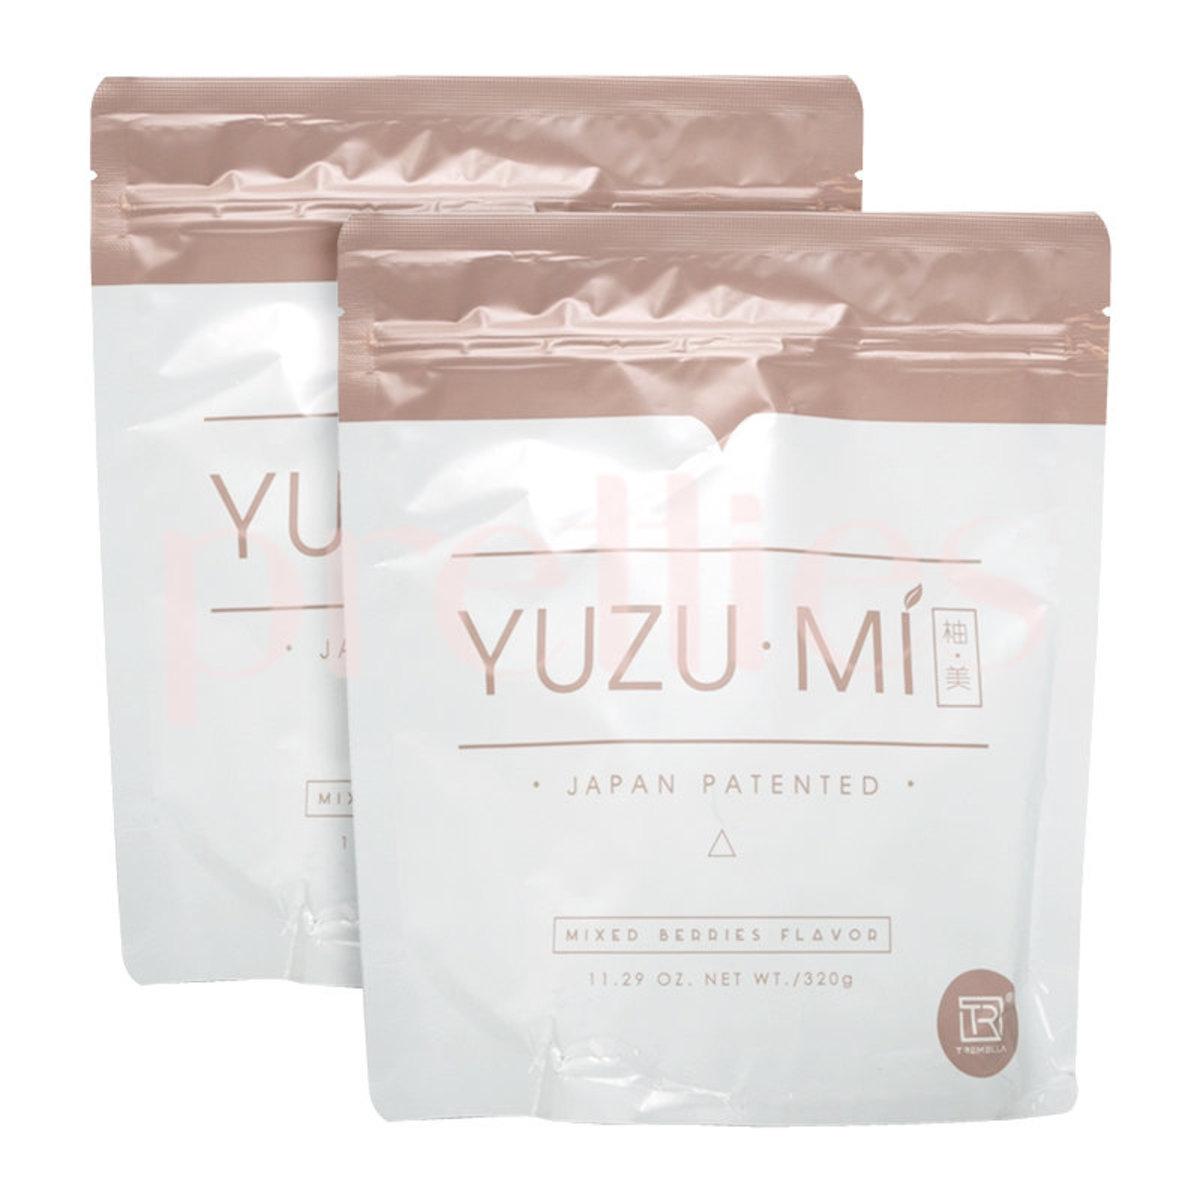 YUZUMI Comprehensive Detox Drink Veggies Fruits And Enzyme(16pcs x20g) x2pcs (Parallel Import)